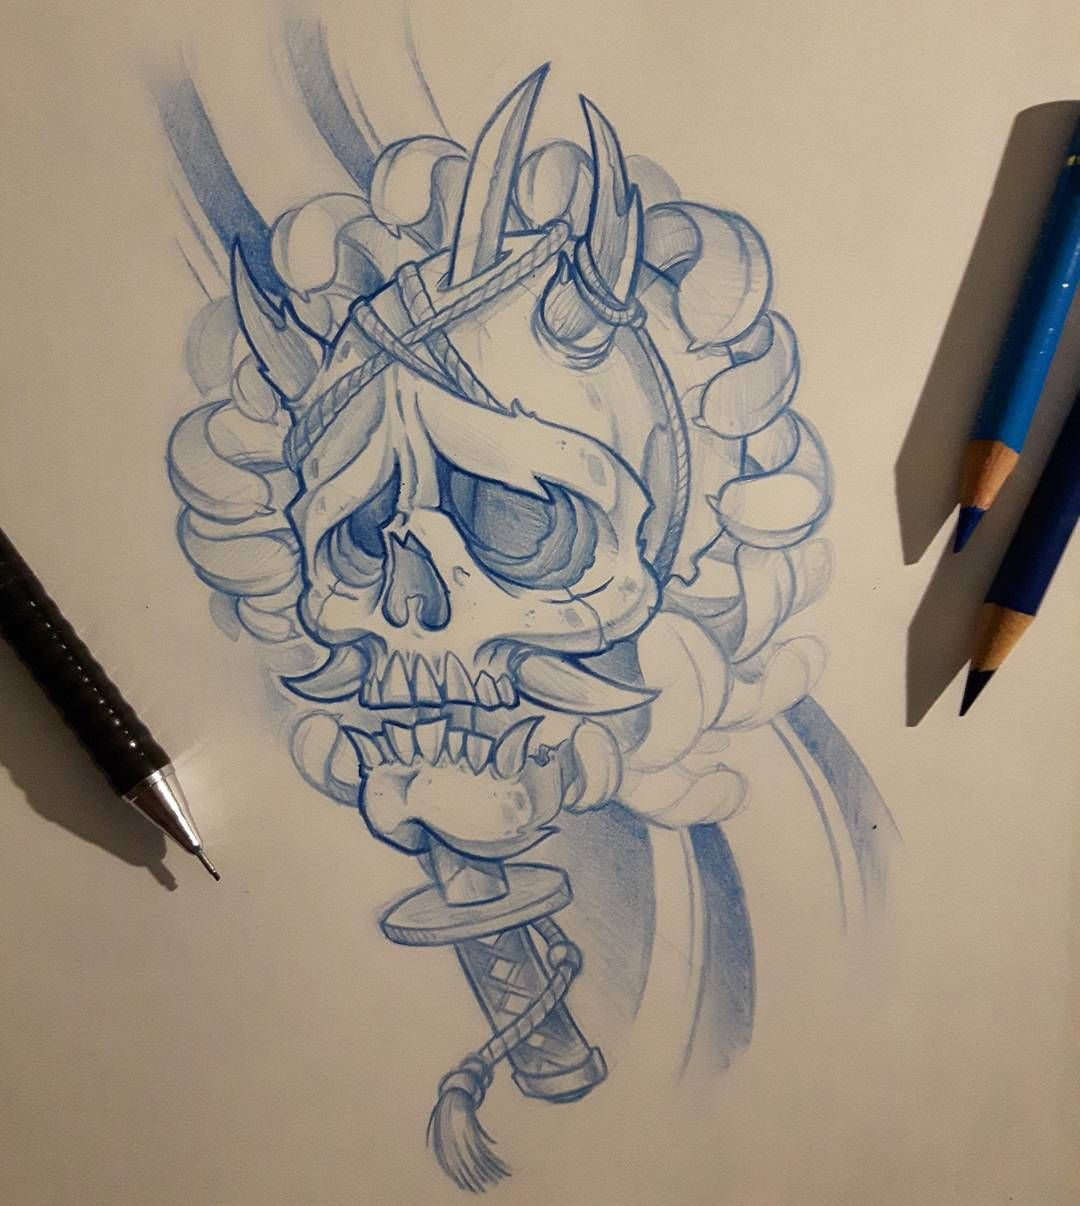 Graffiti Tattoo Sketches Drawings